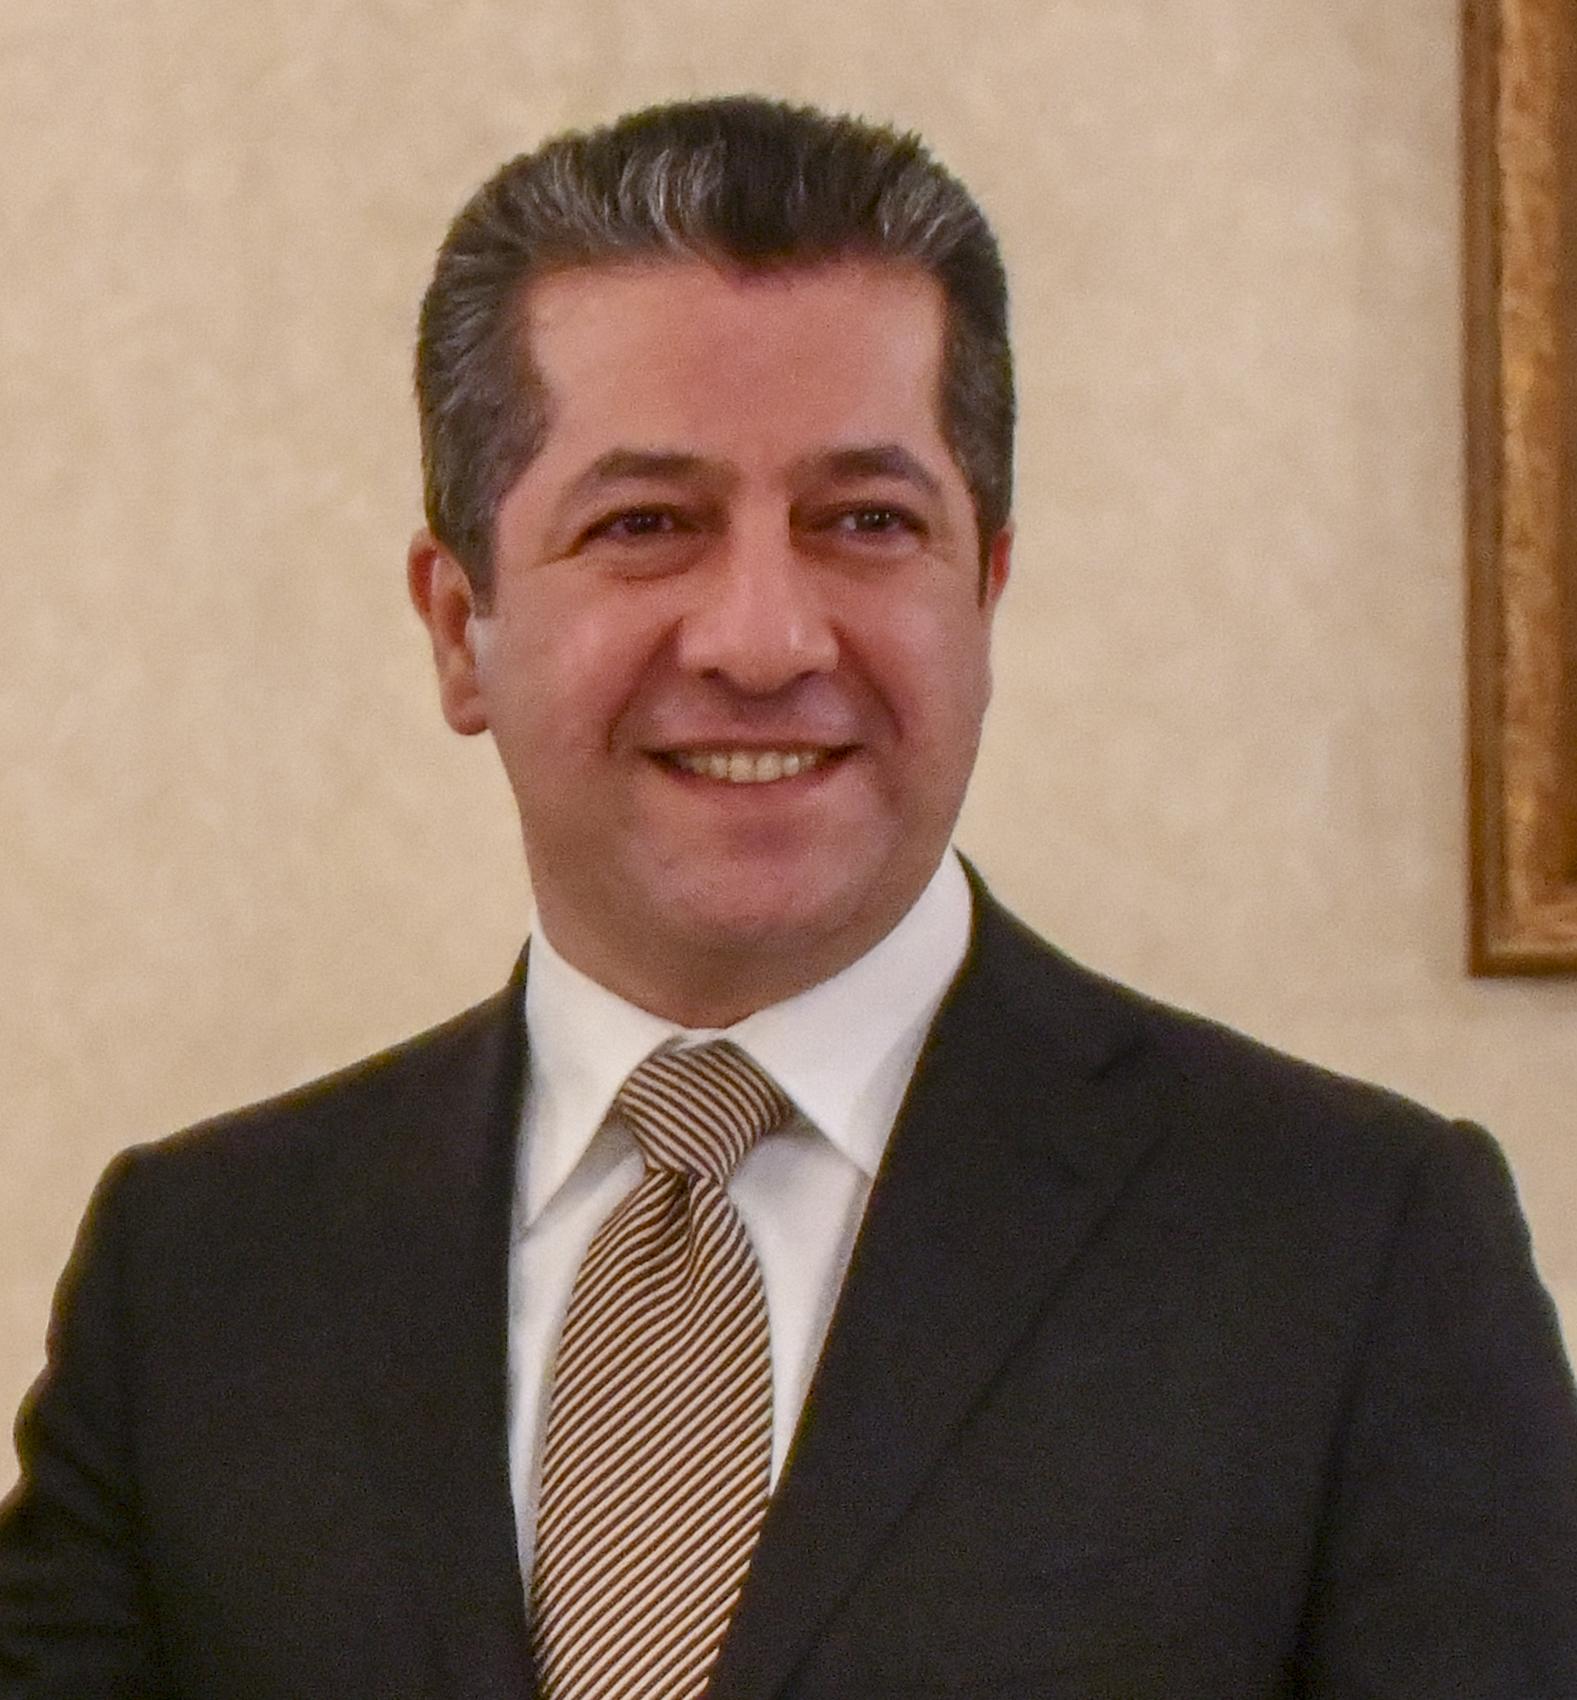 New Iraqi Kurdish president's cousin succeeds him as regional prime minister